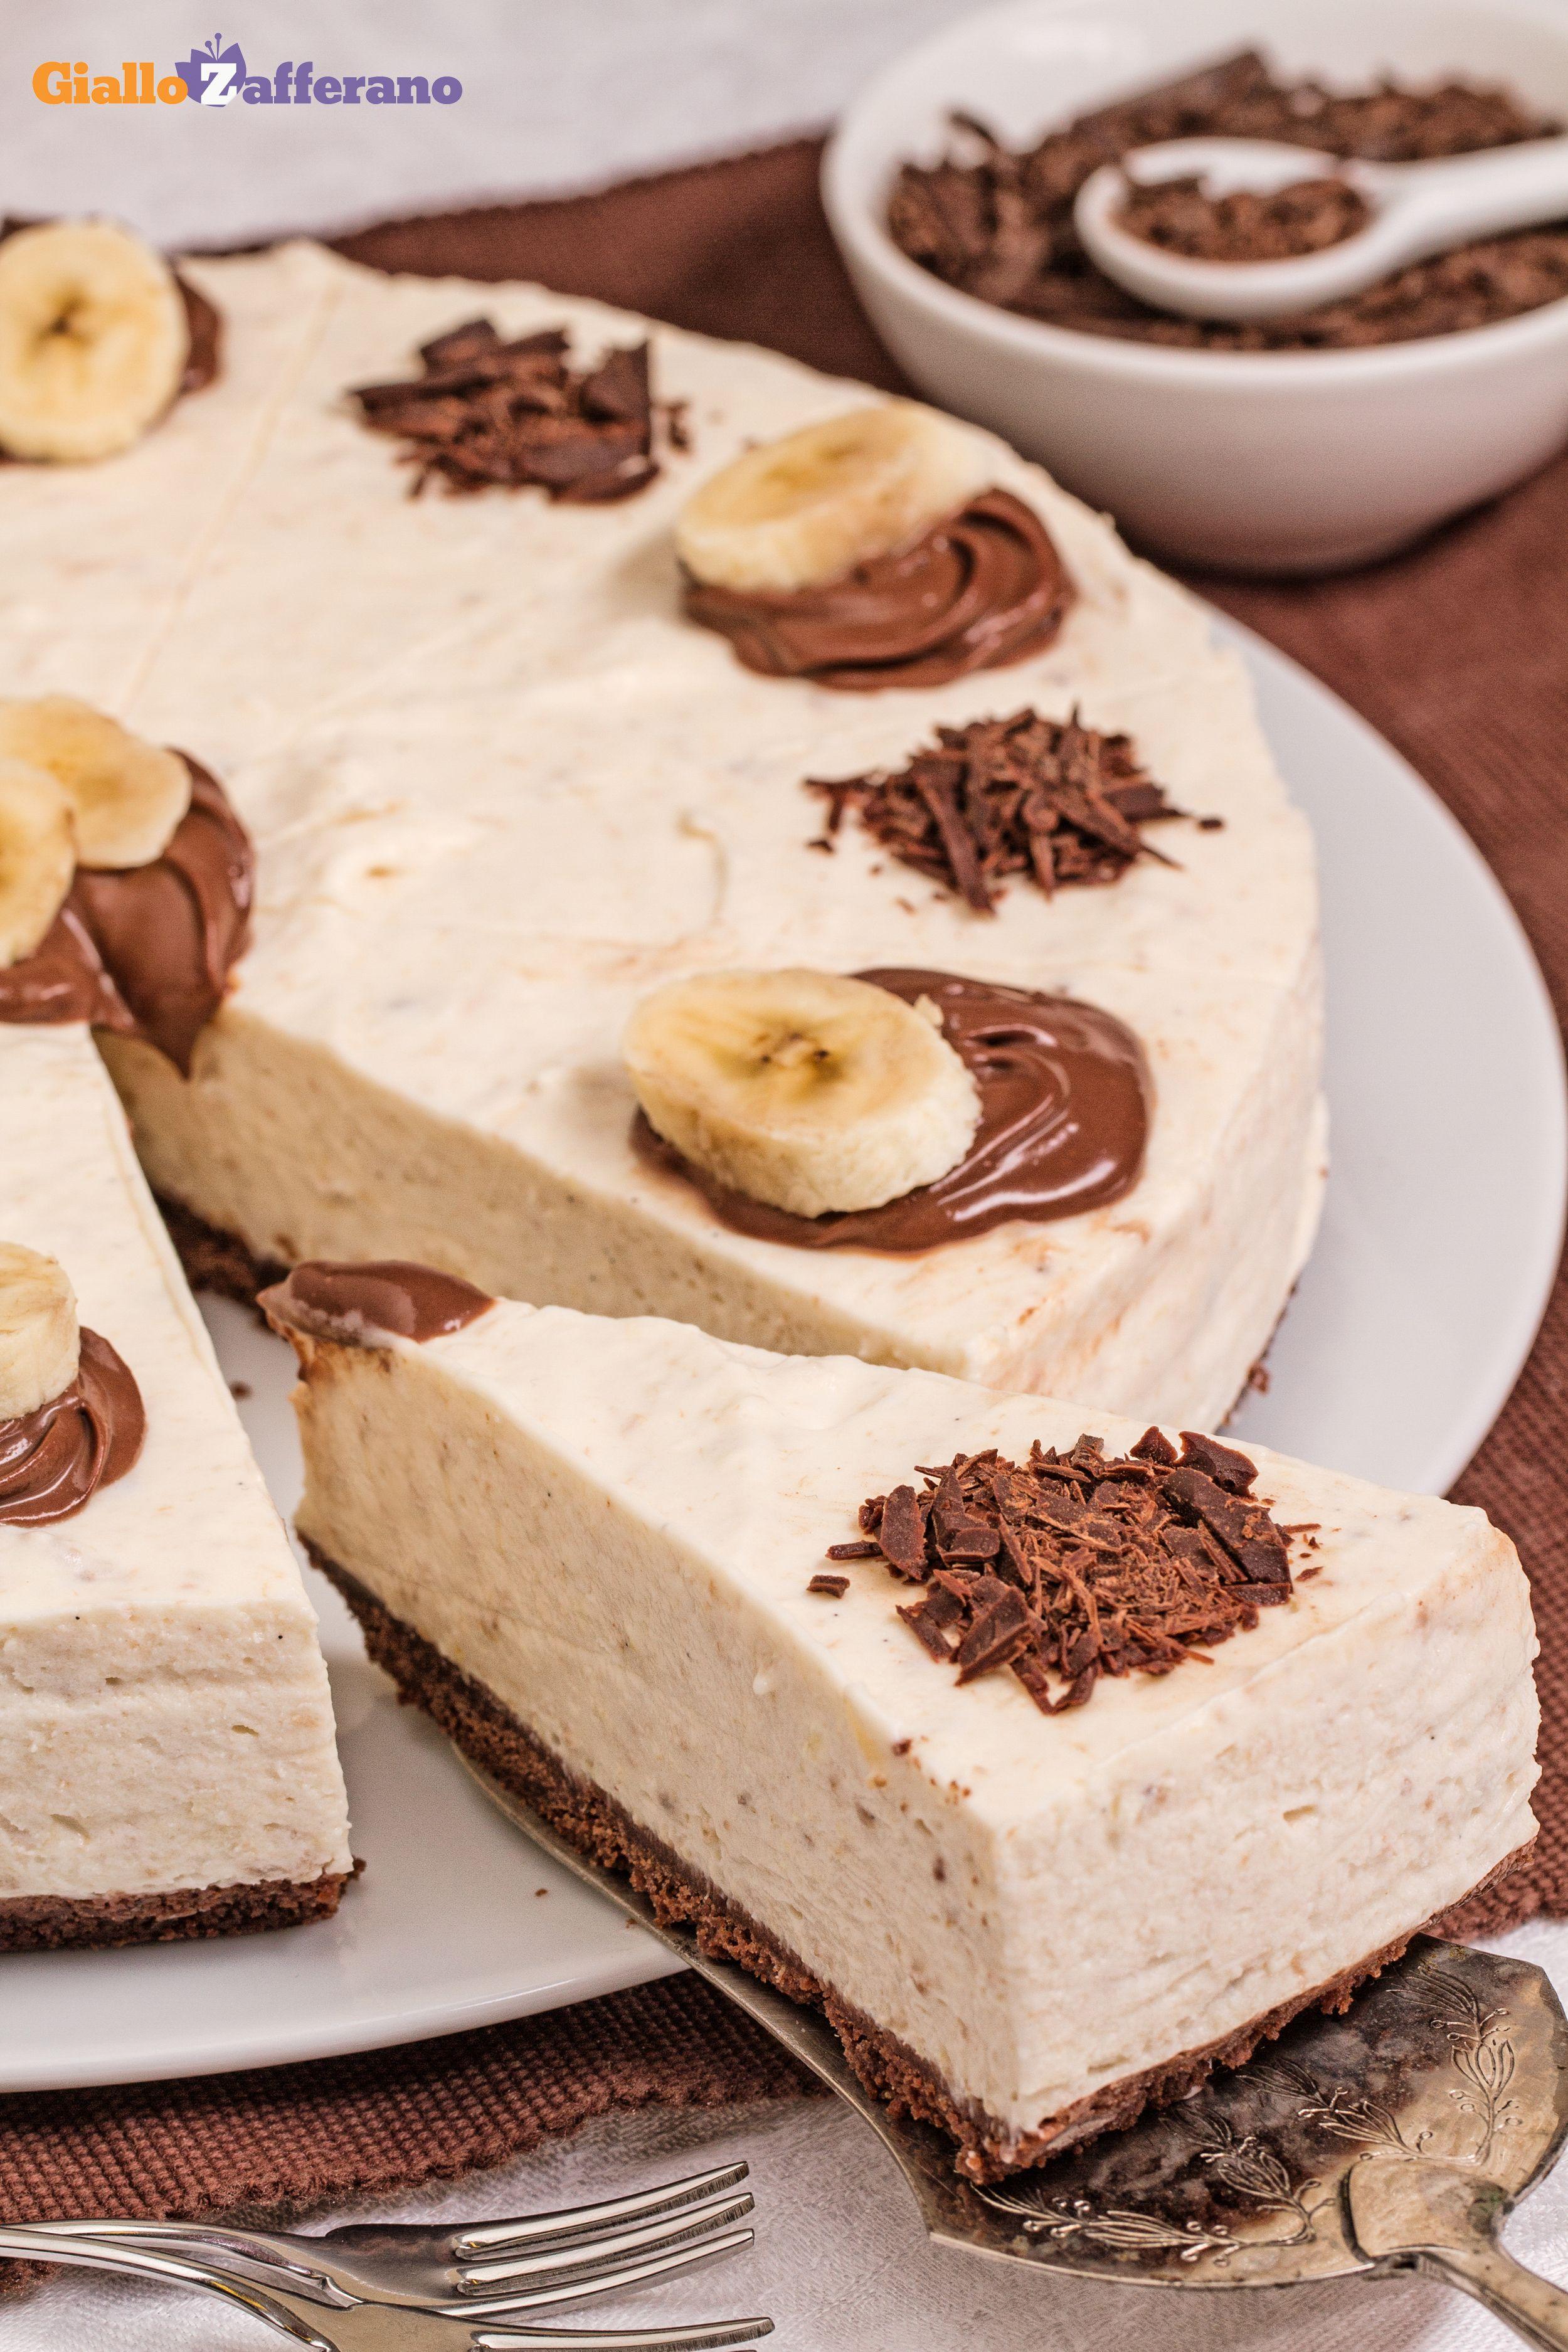 499dca090aaa0906bb722361c97b8fed - Ricette Con Banane